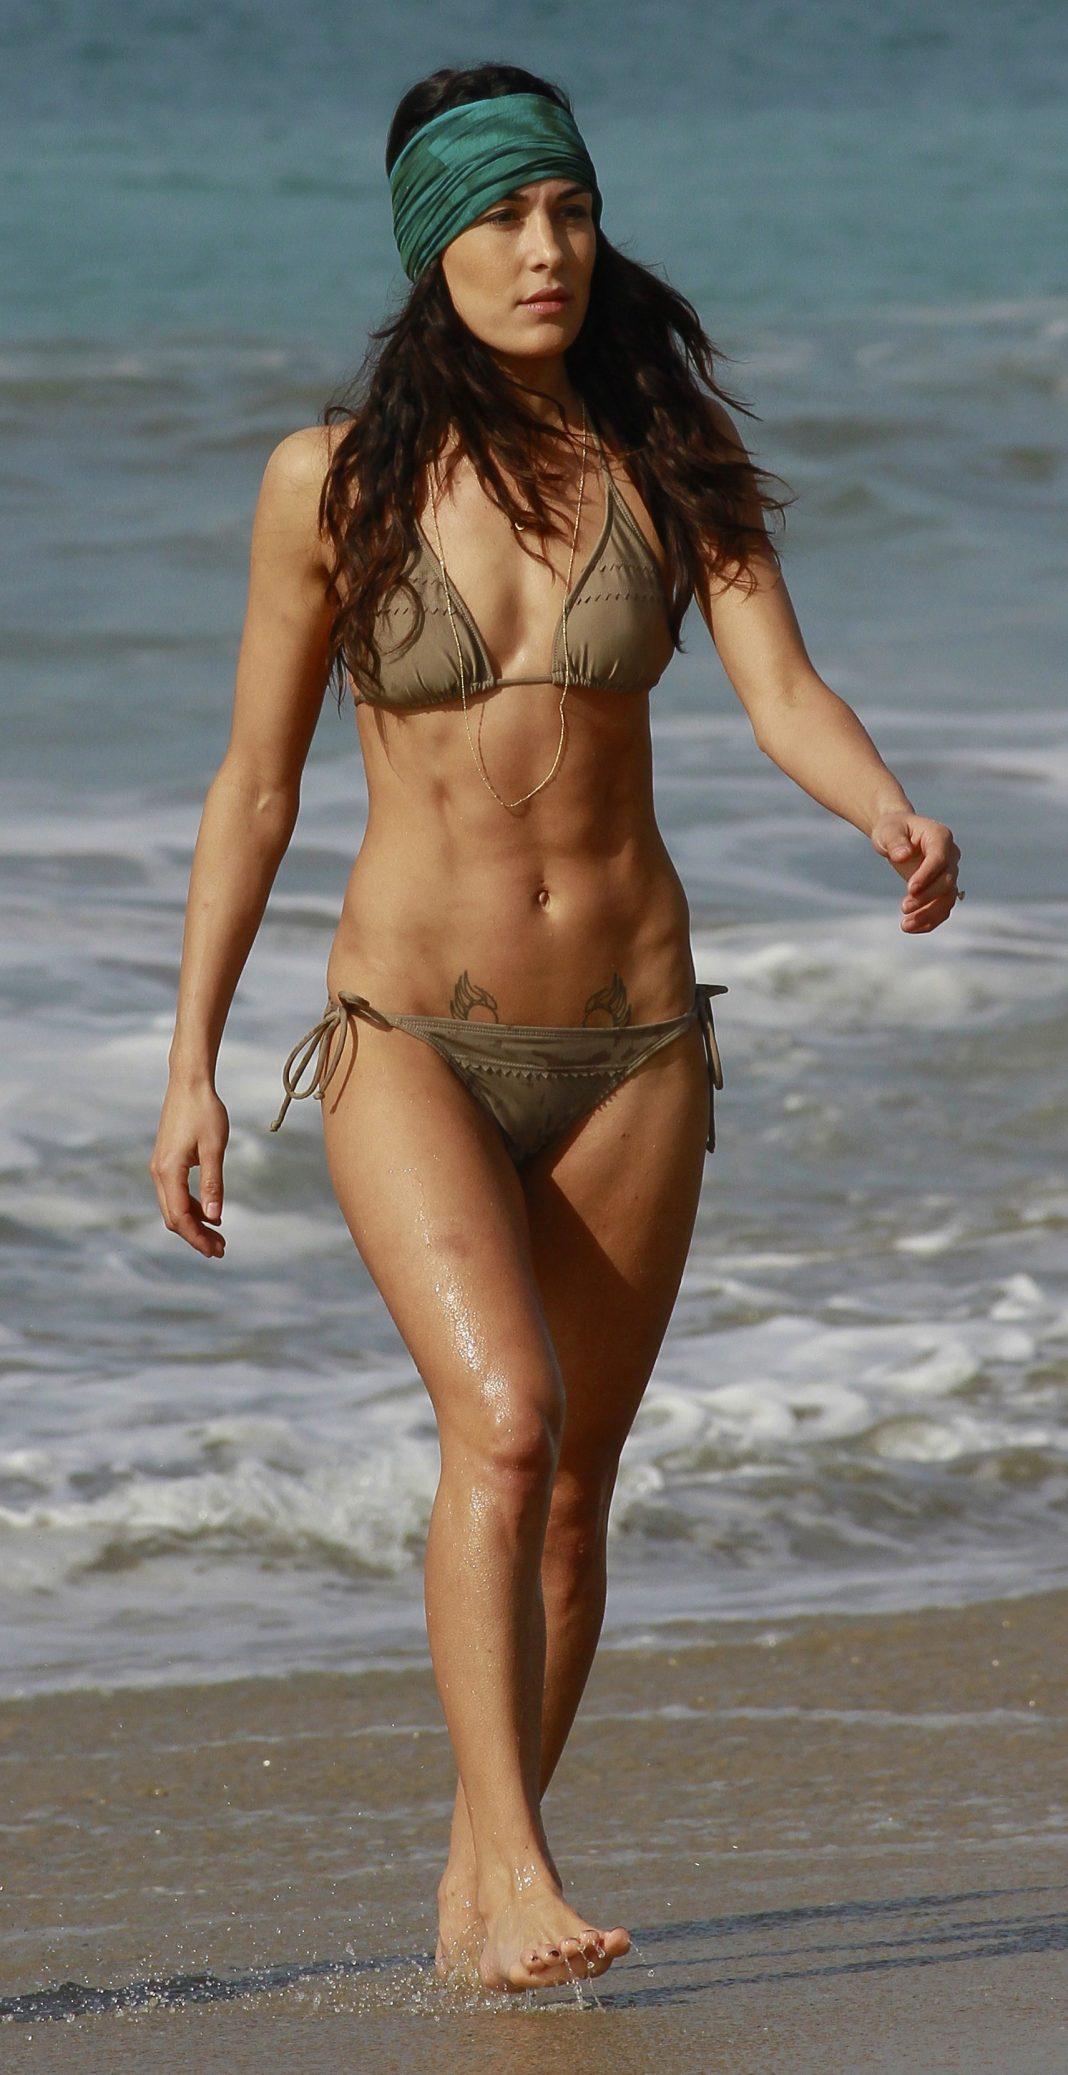 Brie Bella beautiful bikini pics